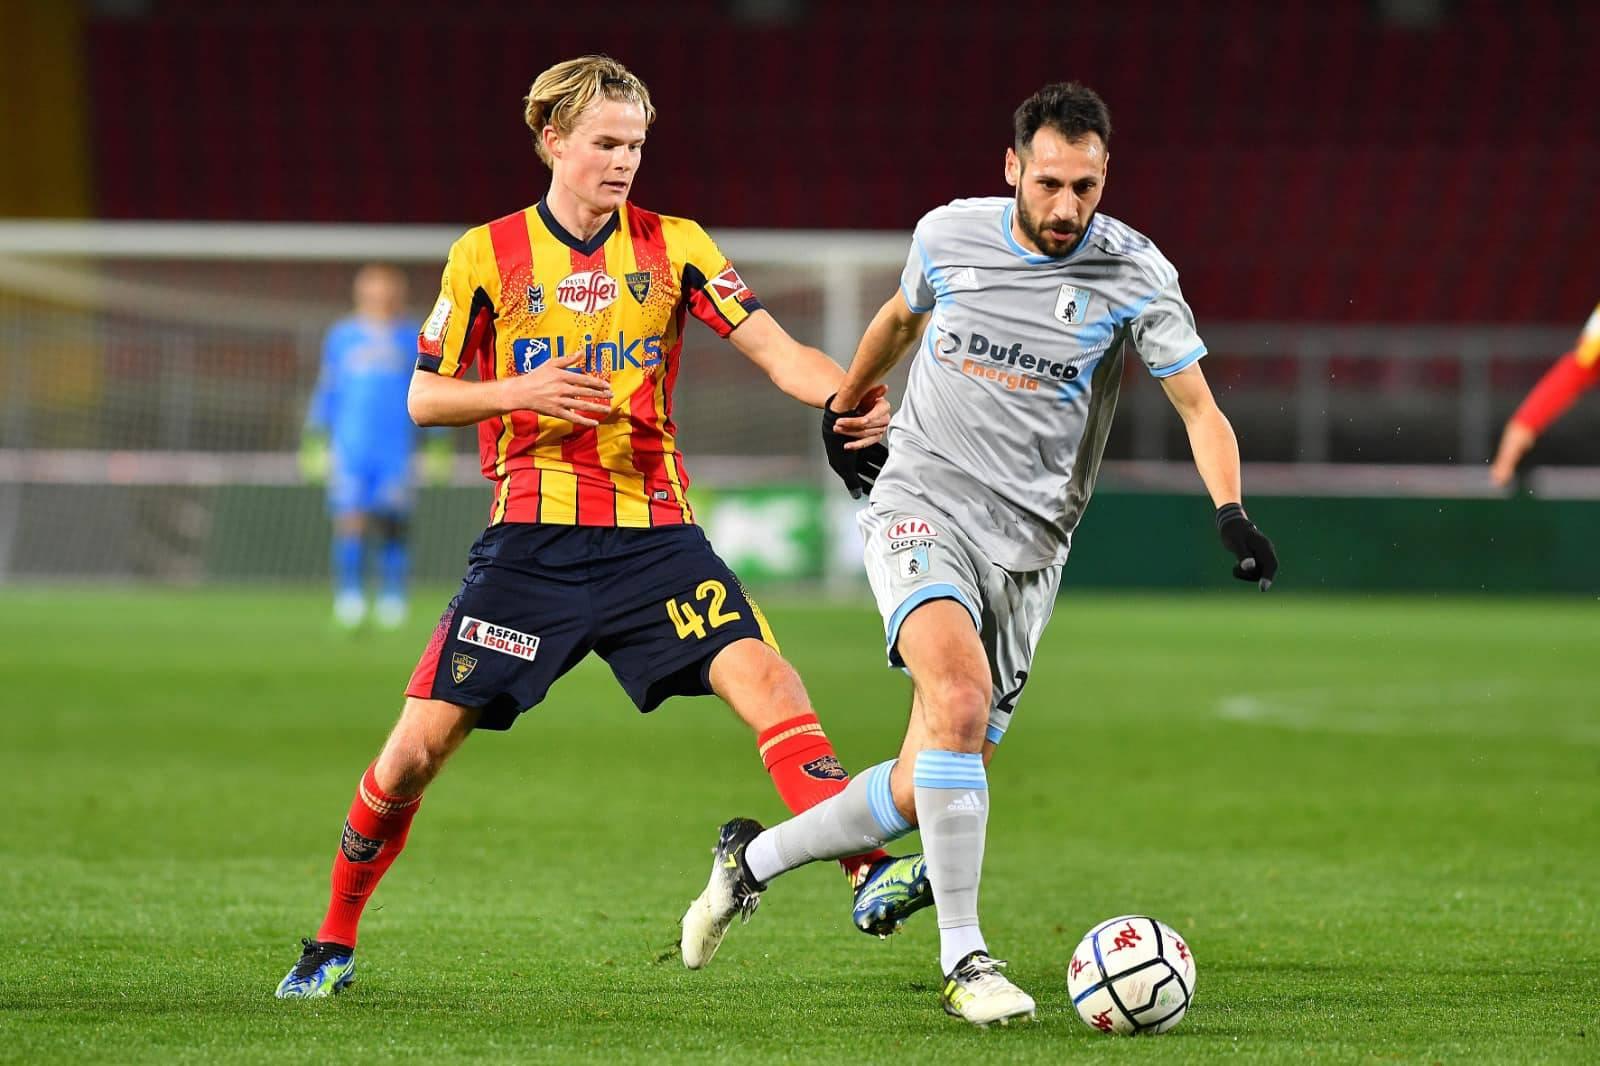 Lecce vs Virtus Entella